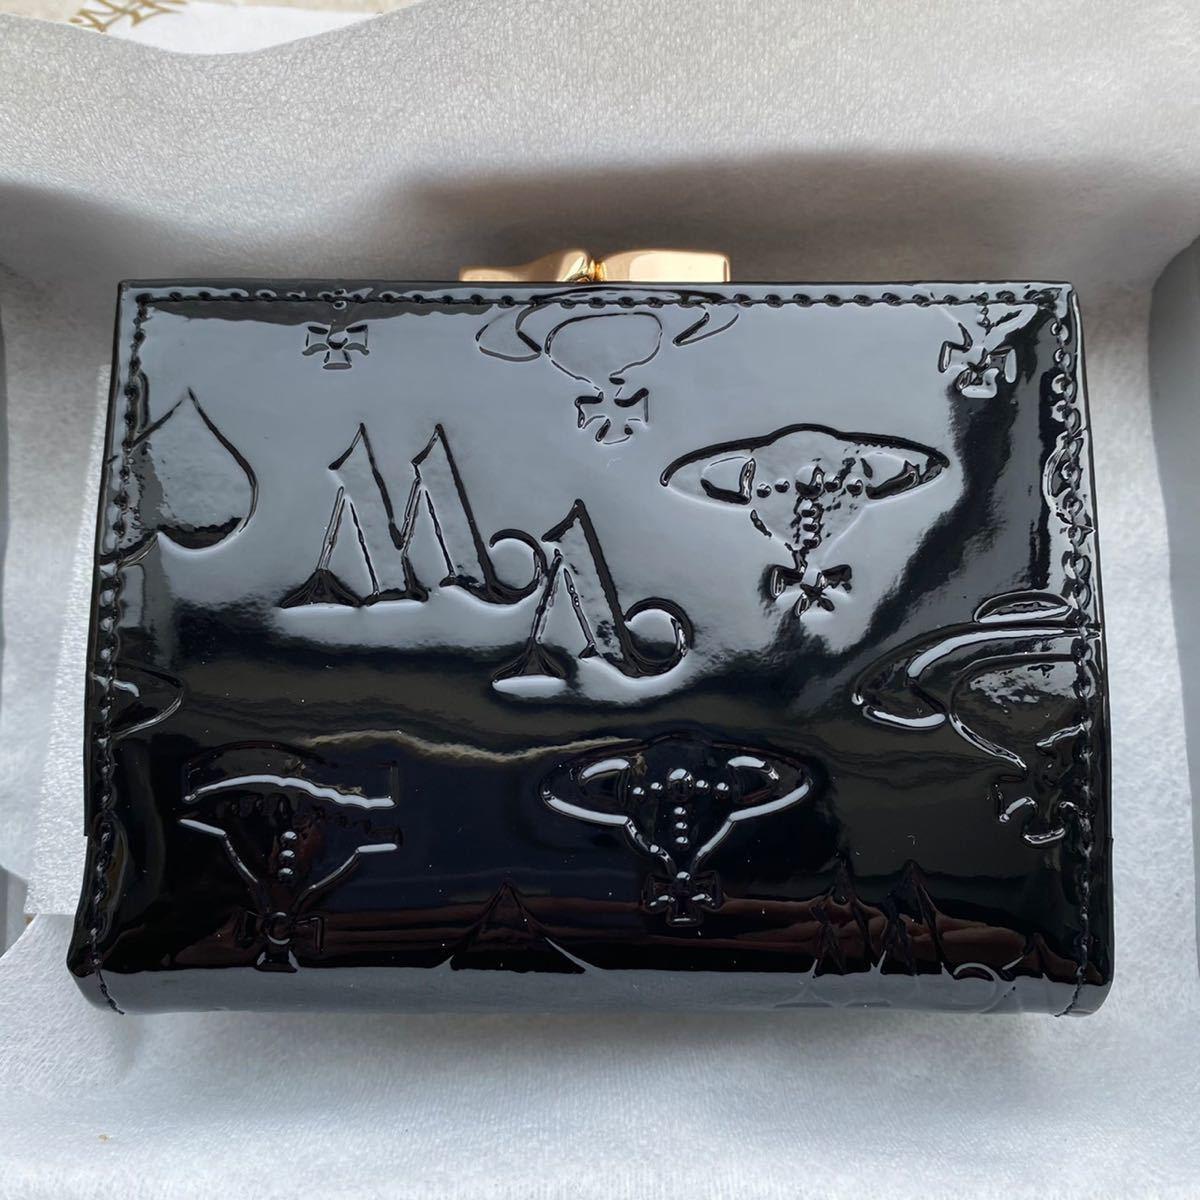 Vivienne Westwood ヴィヴィアンウエストウッド エナメル財布 ヴィヴィアンウェストウッド 三つ折り財布